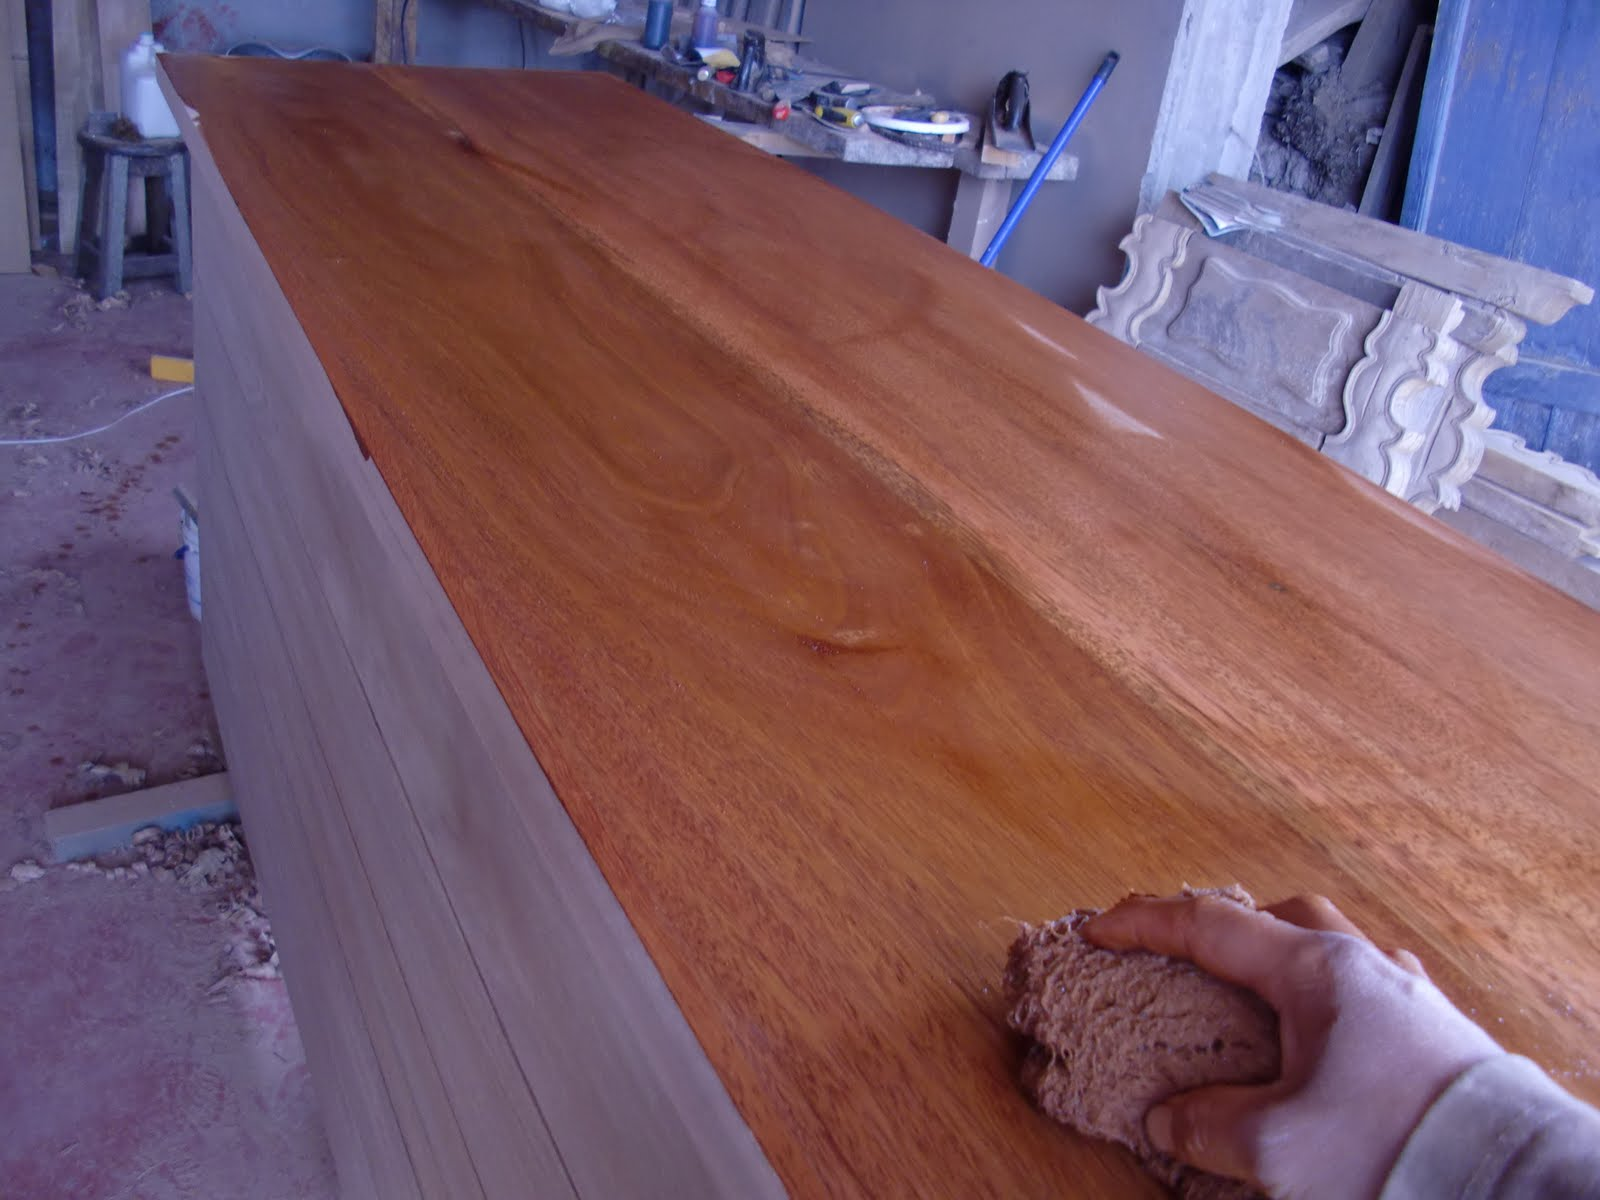 Decoraciones manualidades en madera pintar mueble paso a paso - Muebles pino para pintar ...